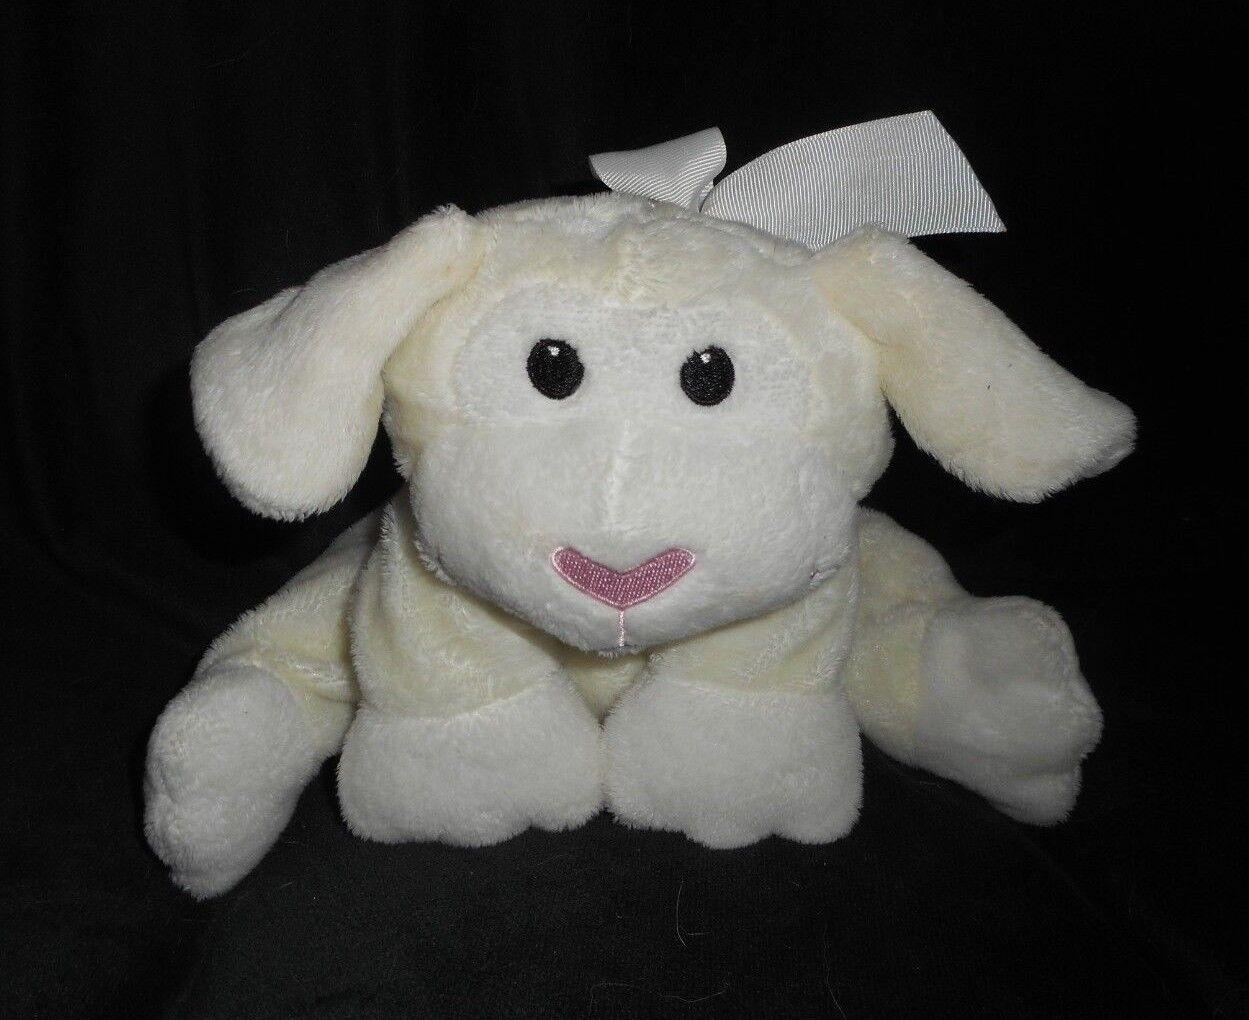 12    2007 ANIMAL ADVENTURE BABY CREME FLOPPY LAMB STUFFED ANIMAL PLUSH TOY W  BOW 467689